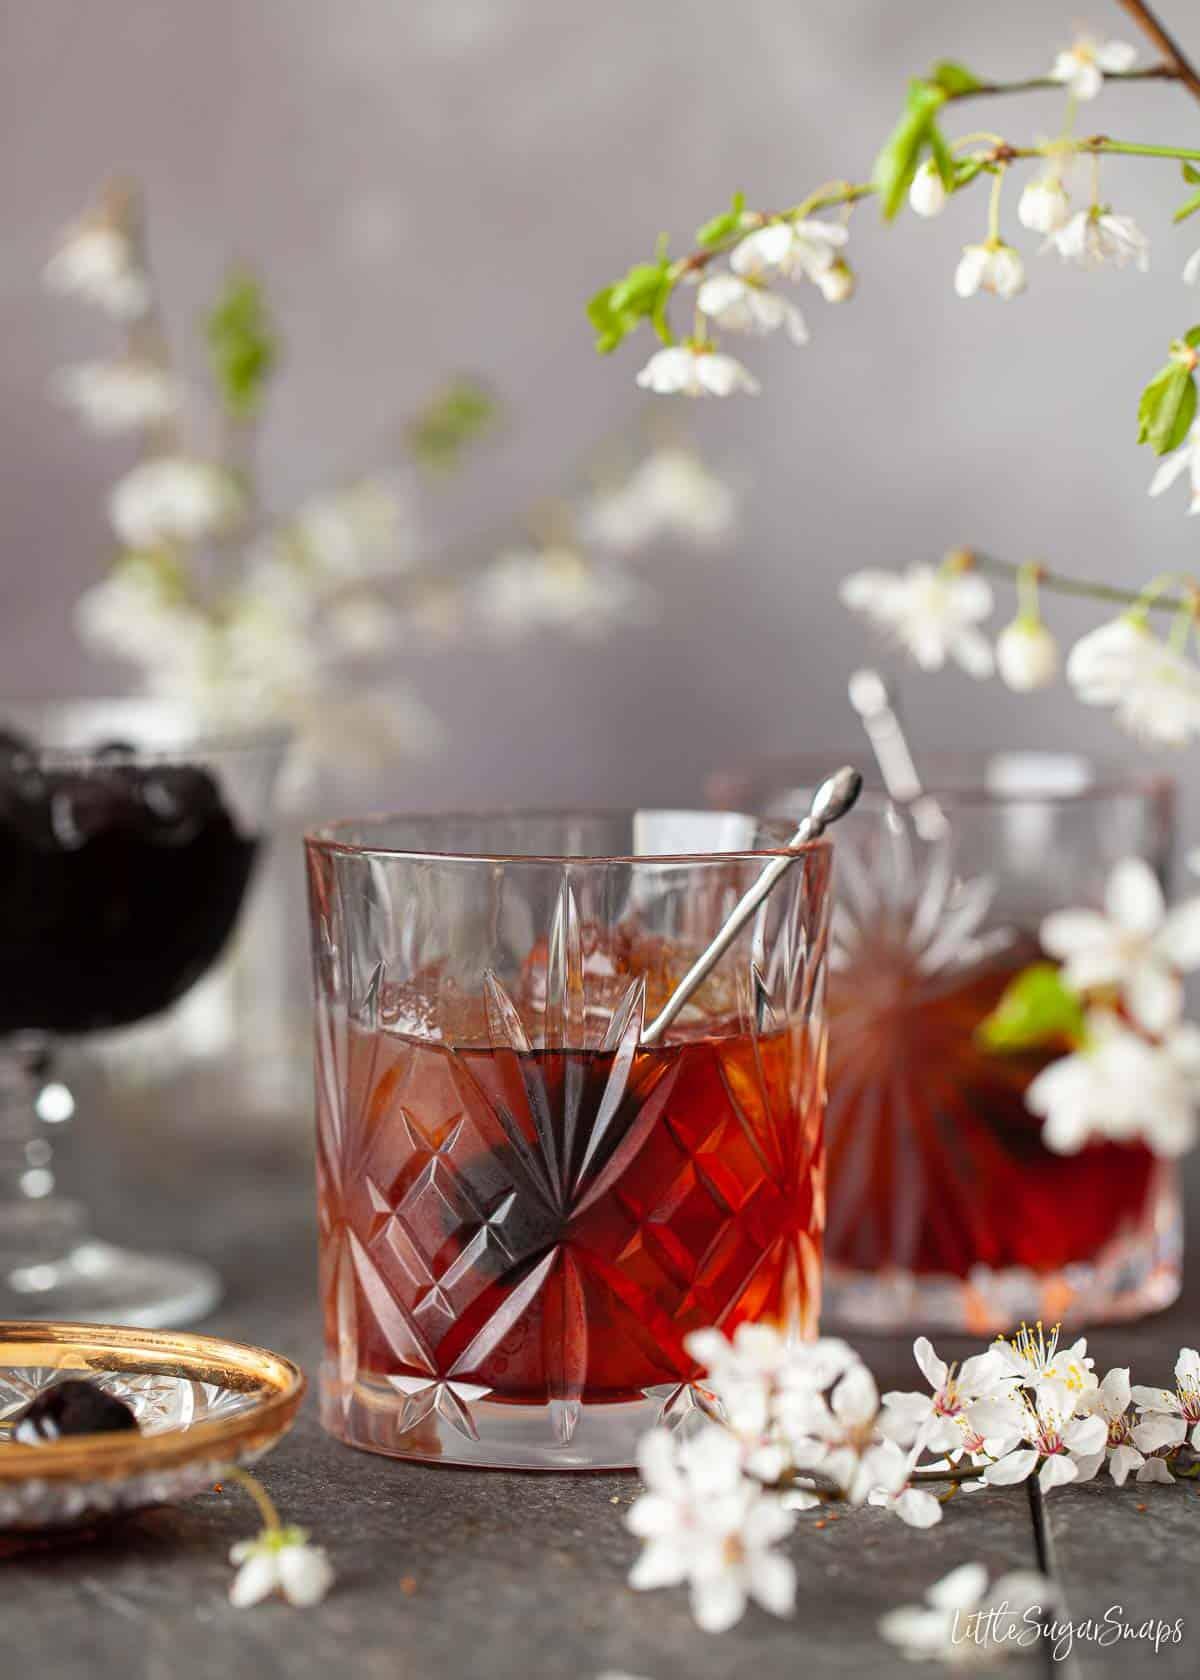 An amaro averna cocktail with dark cherries as a garnish.